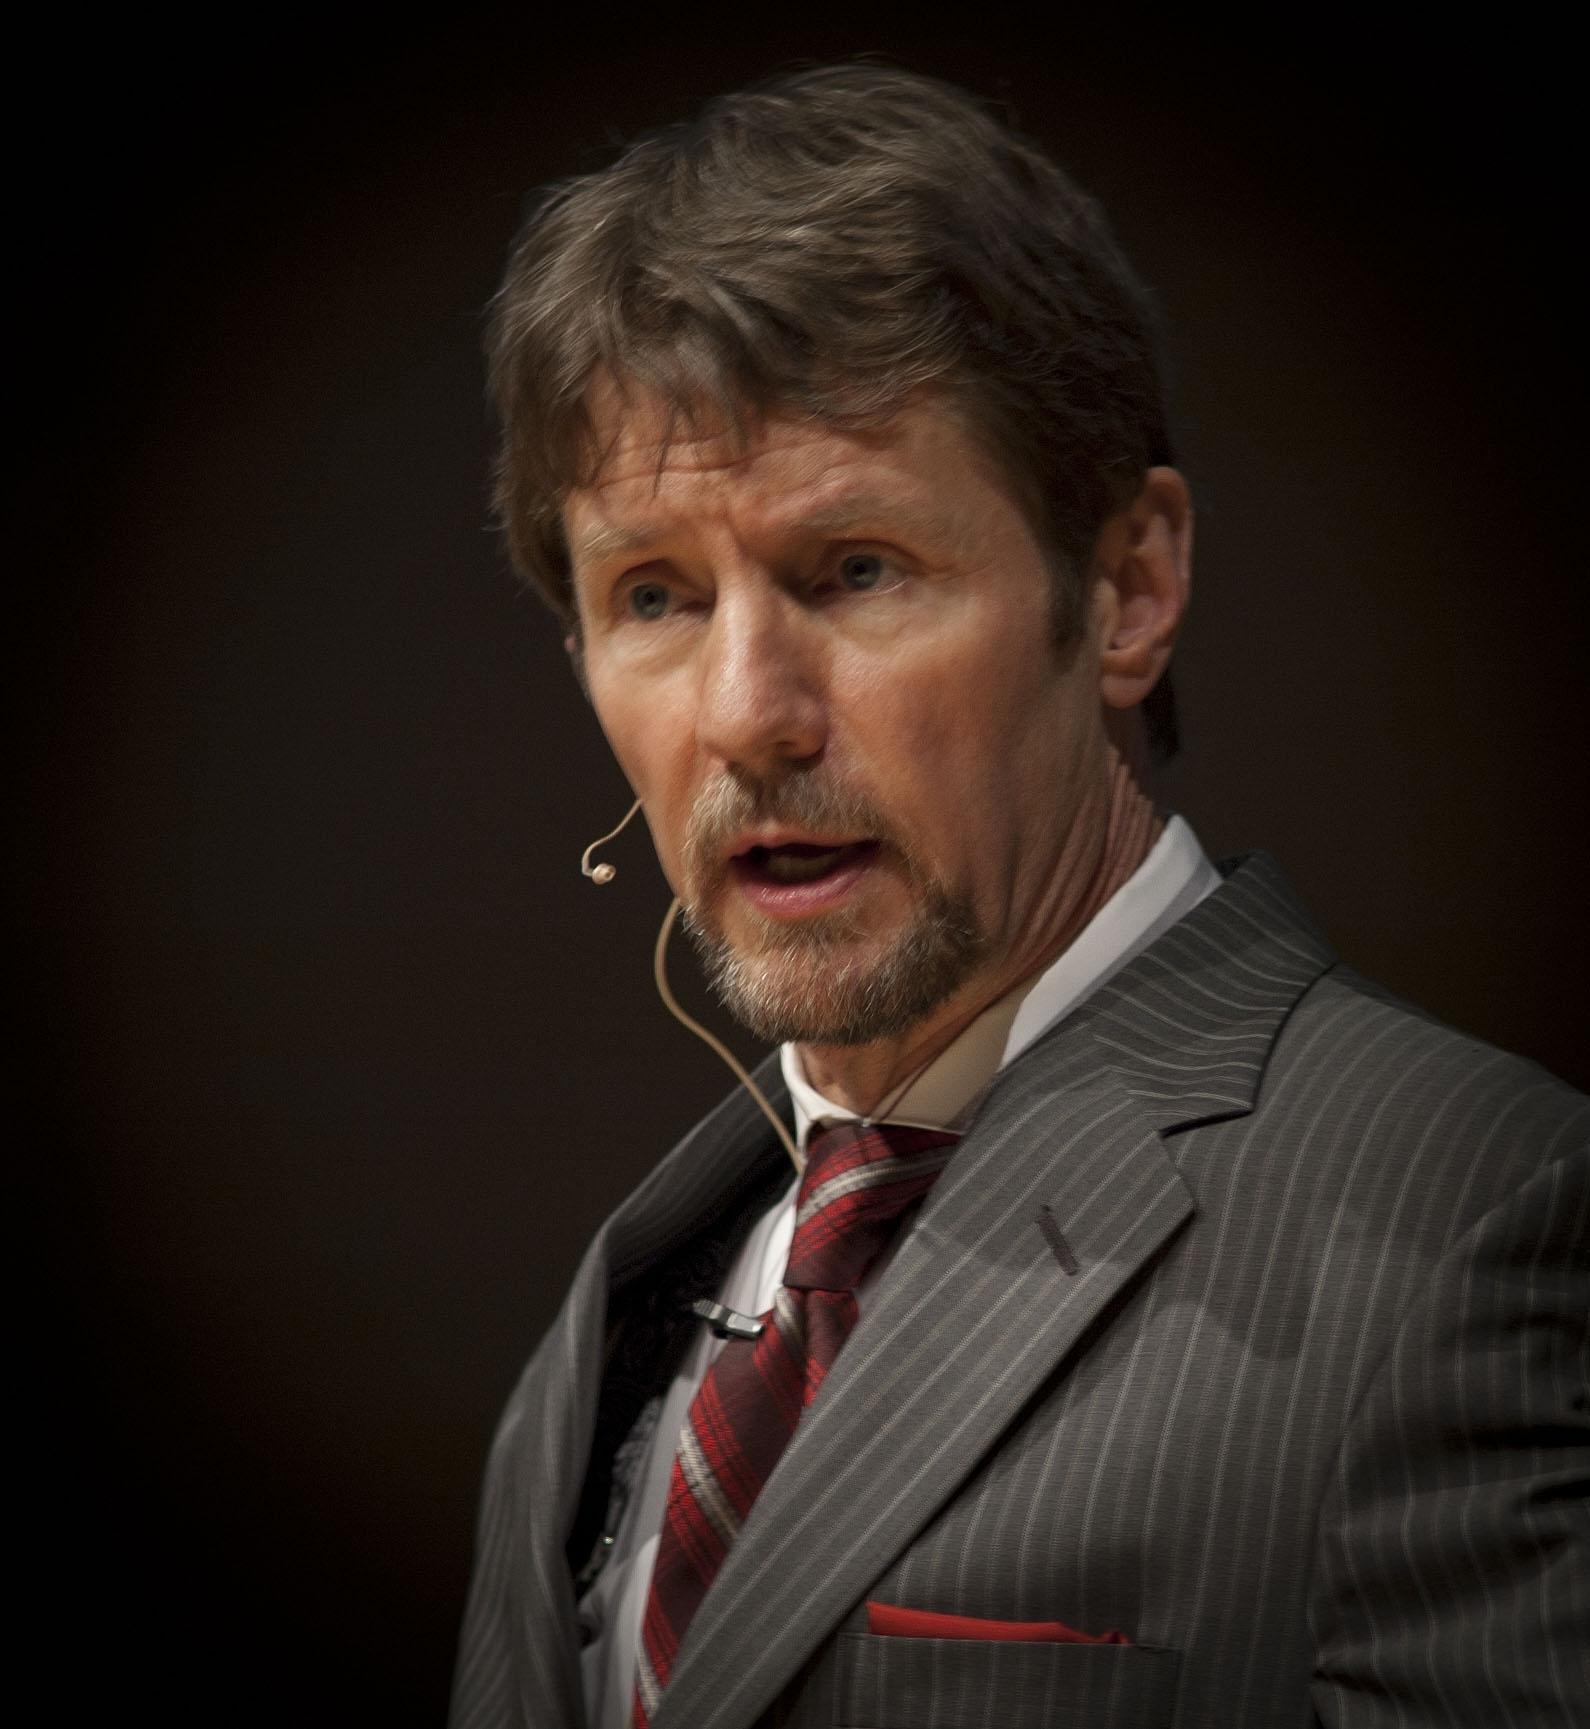 Dr. Patrick C. Friman, Ph.D., ABPP